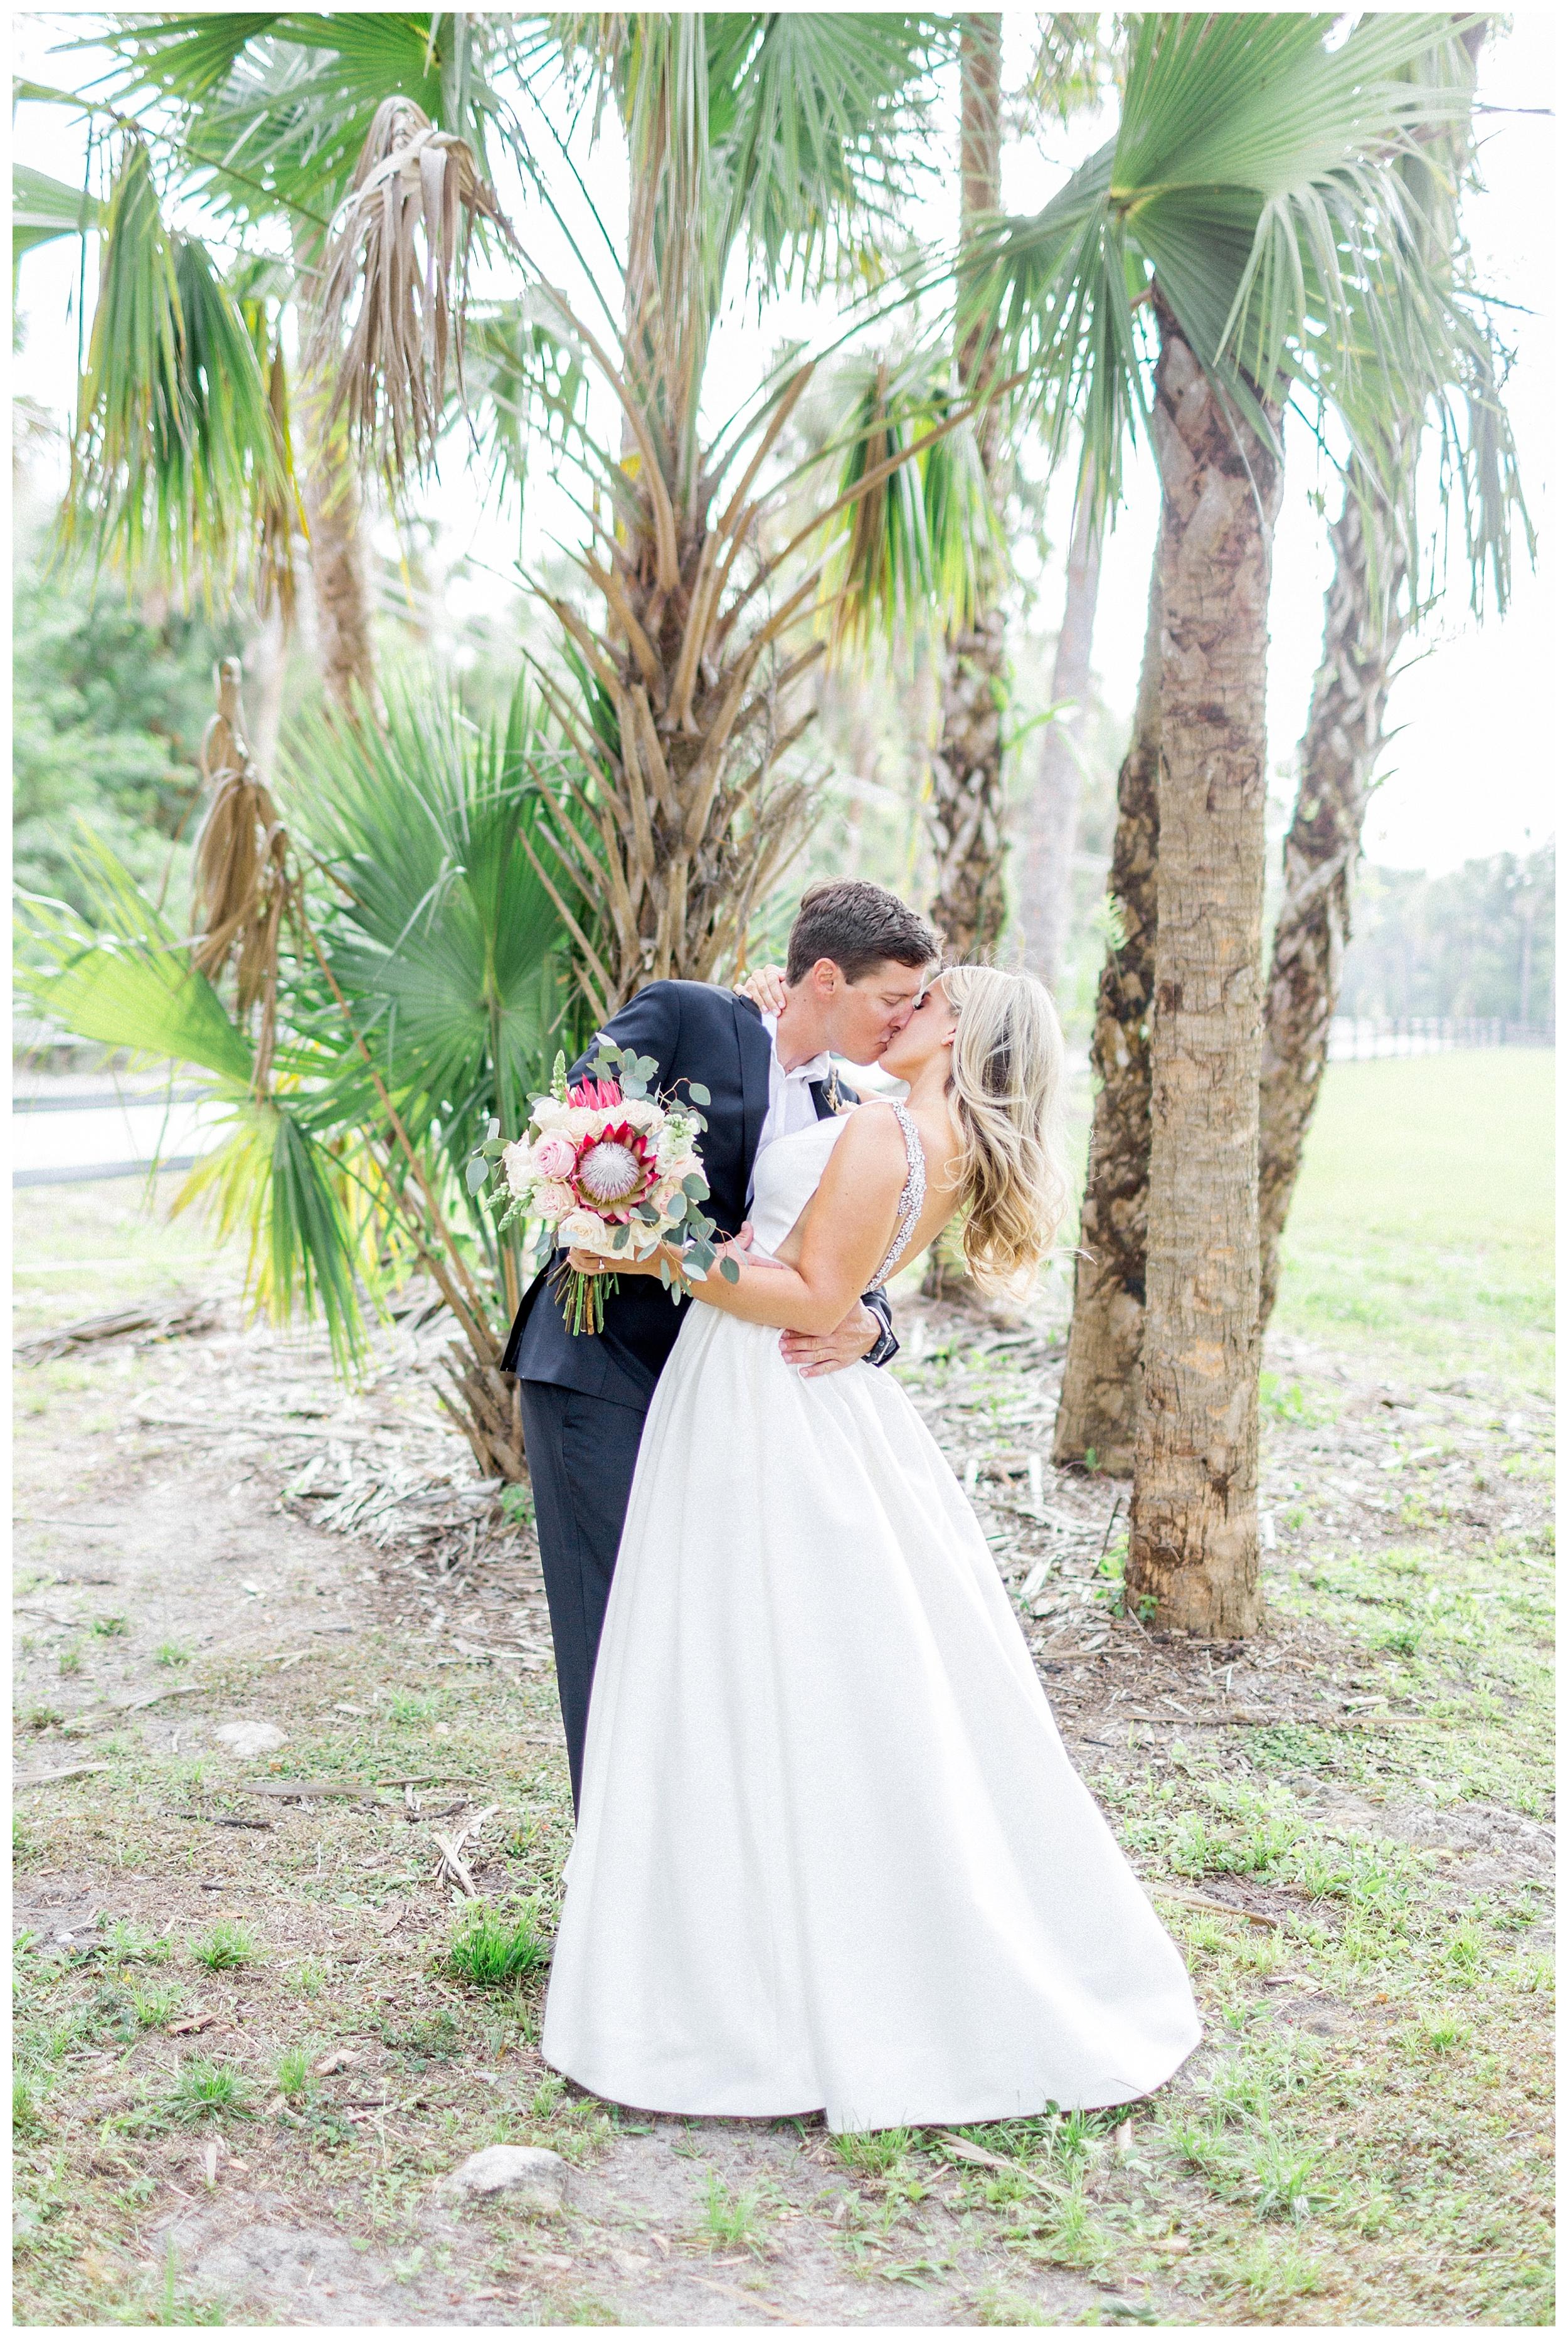 South Florida Wedding Photographer Kir Tuben_0050.jpg